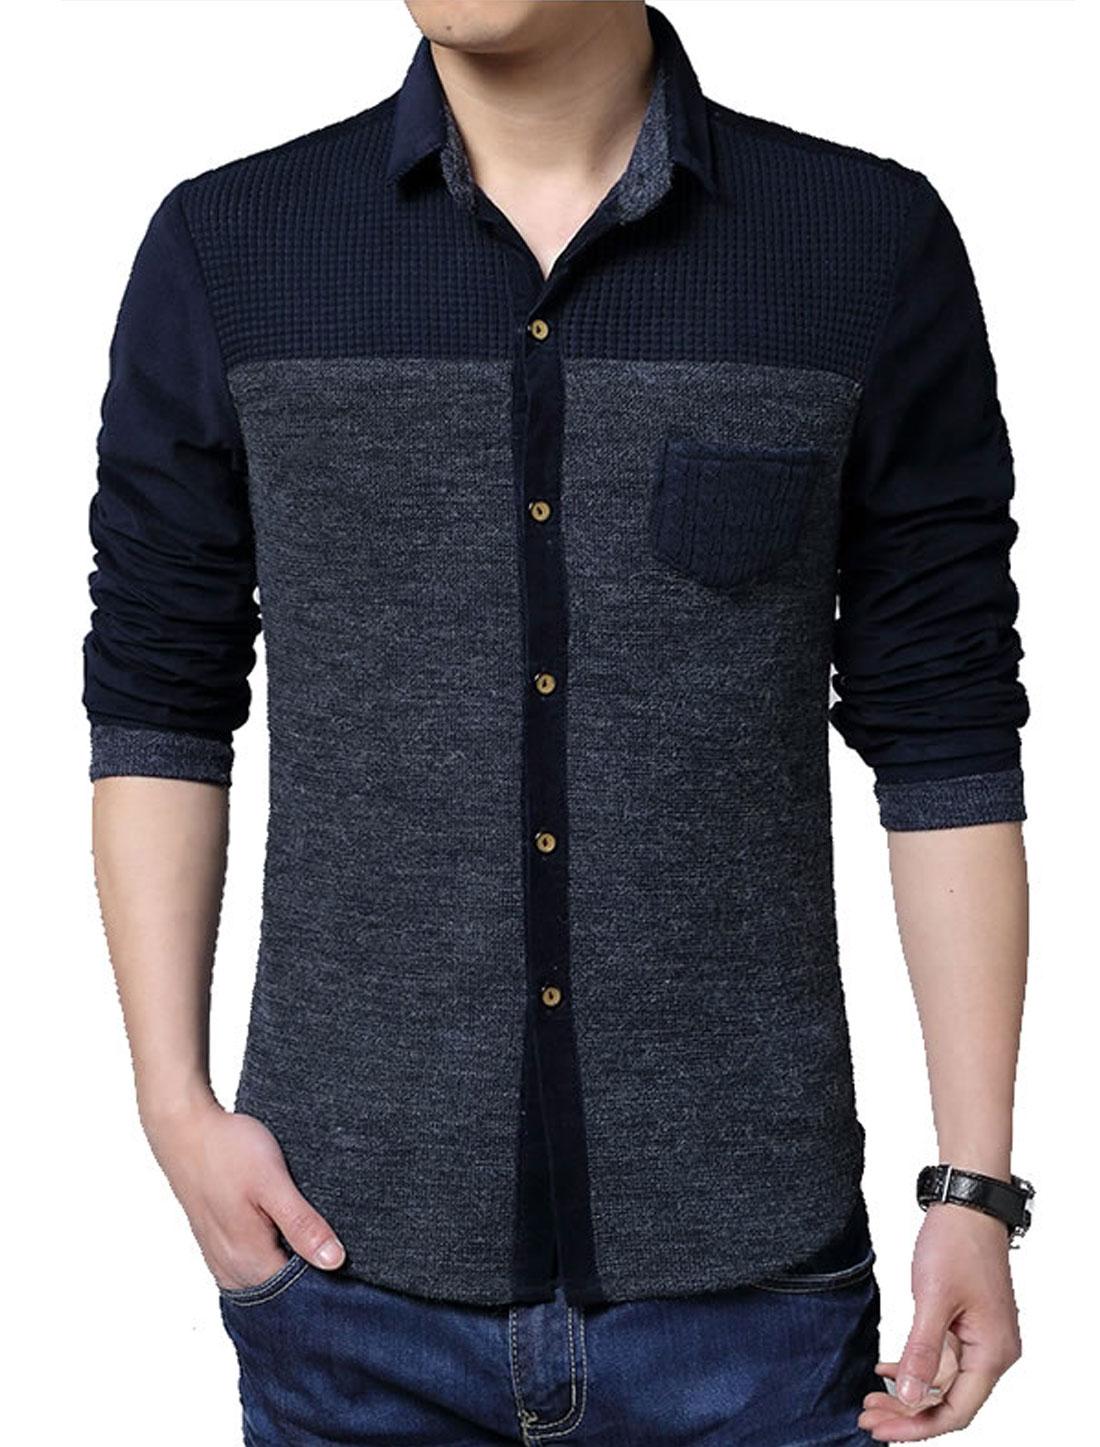 Men Point Collar One Chest Pocket Round Hem Knit Shirt Navy Blue L